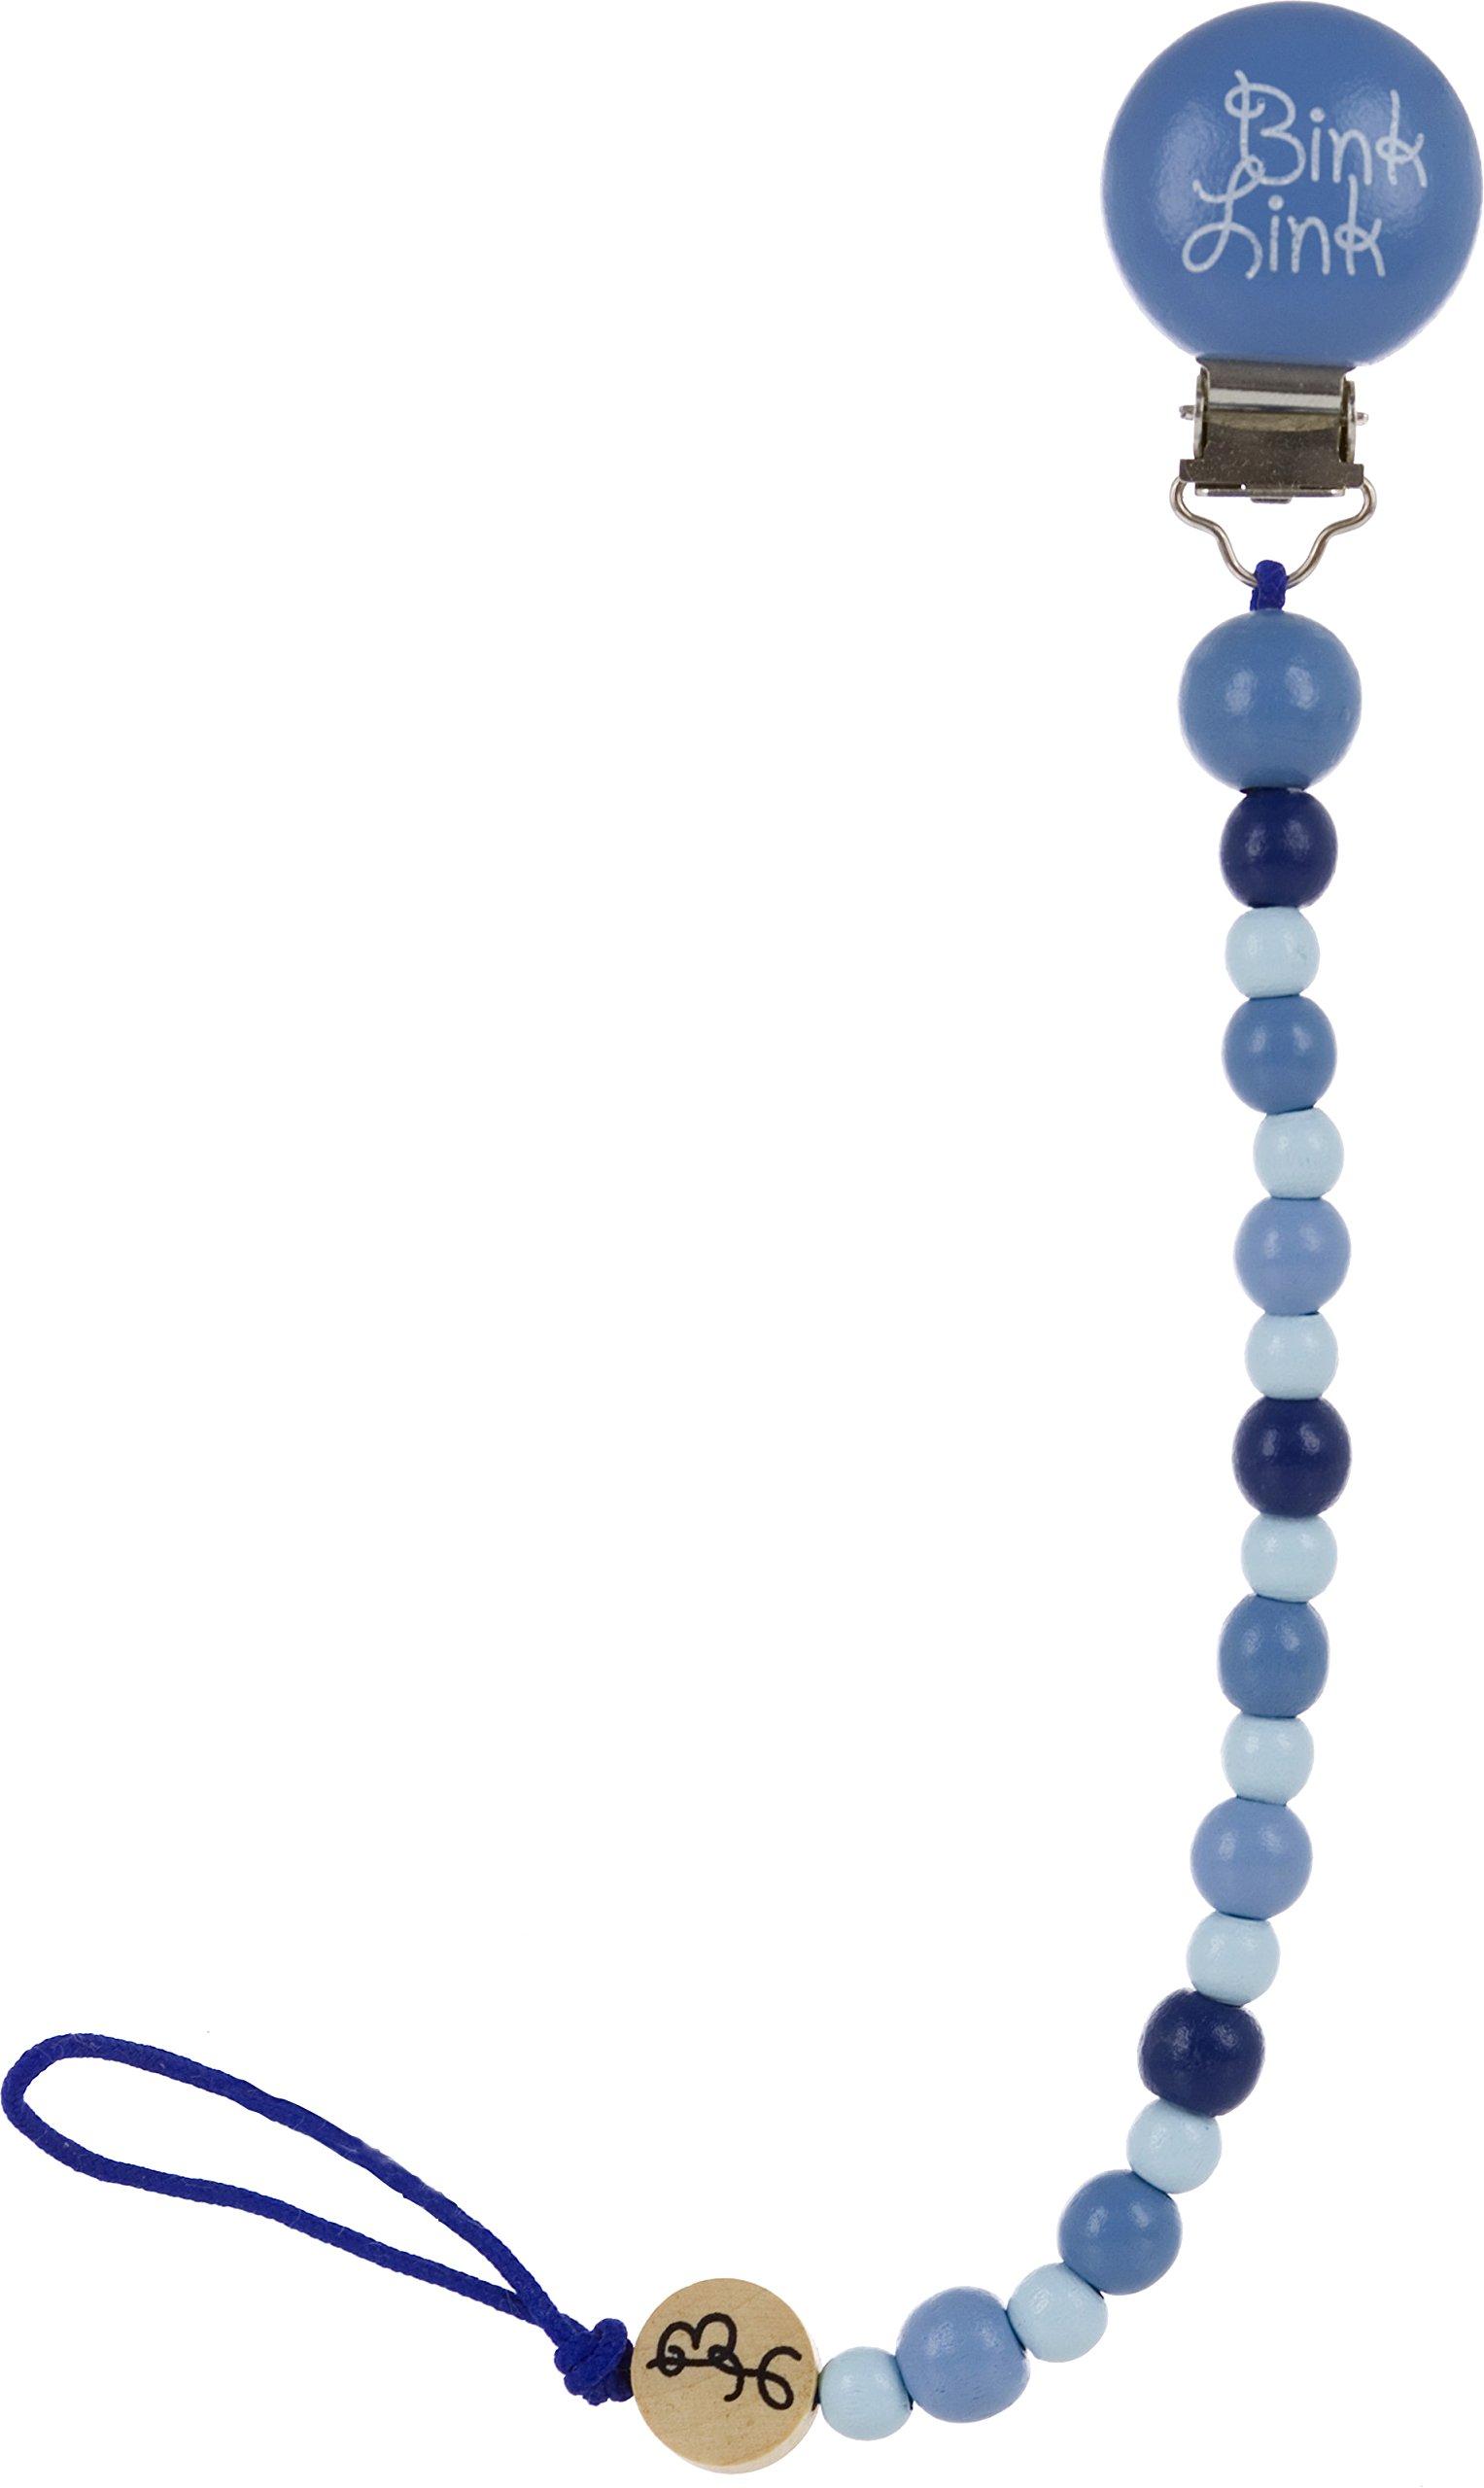 Bink Link Safety Harnesses, Blueberry